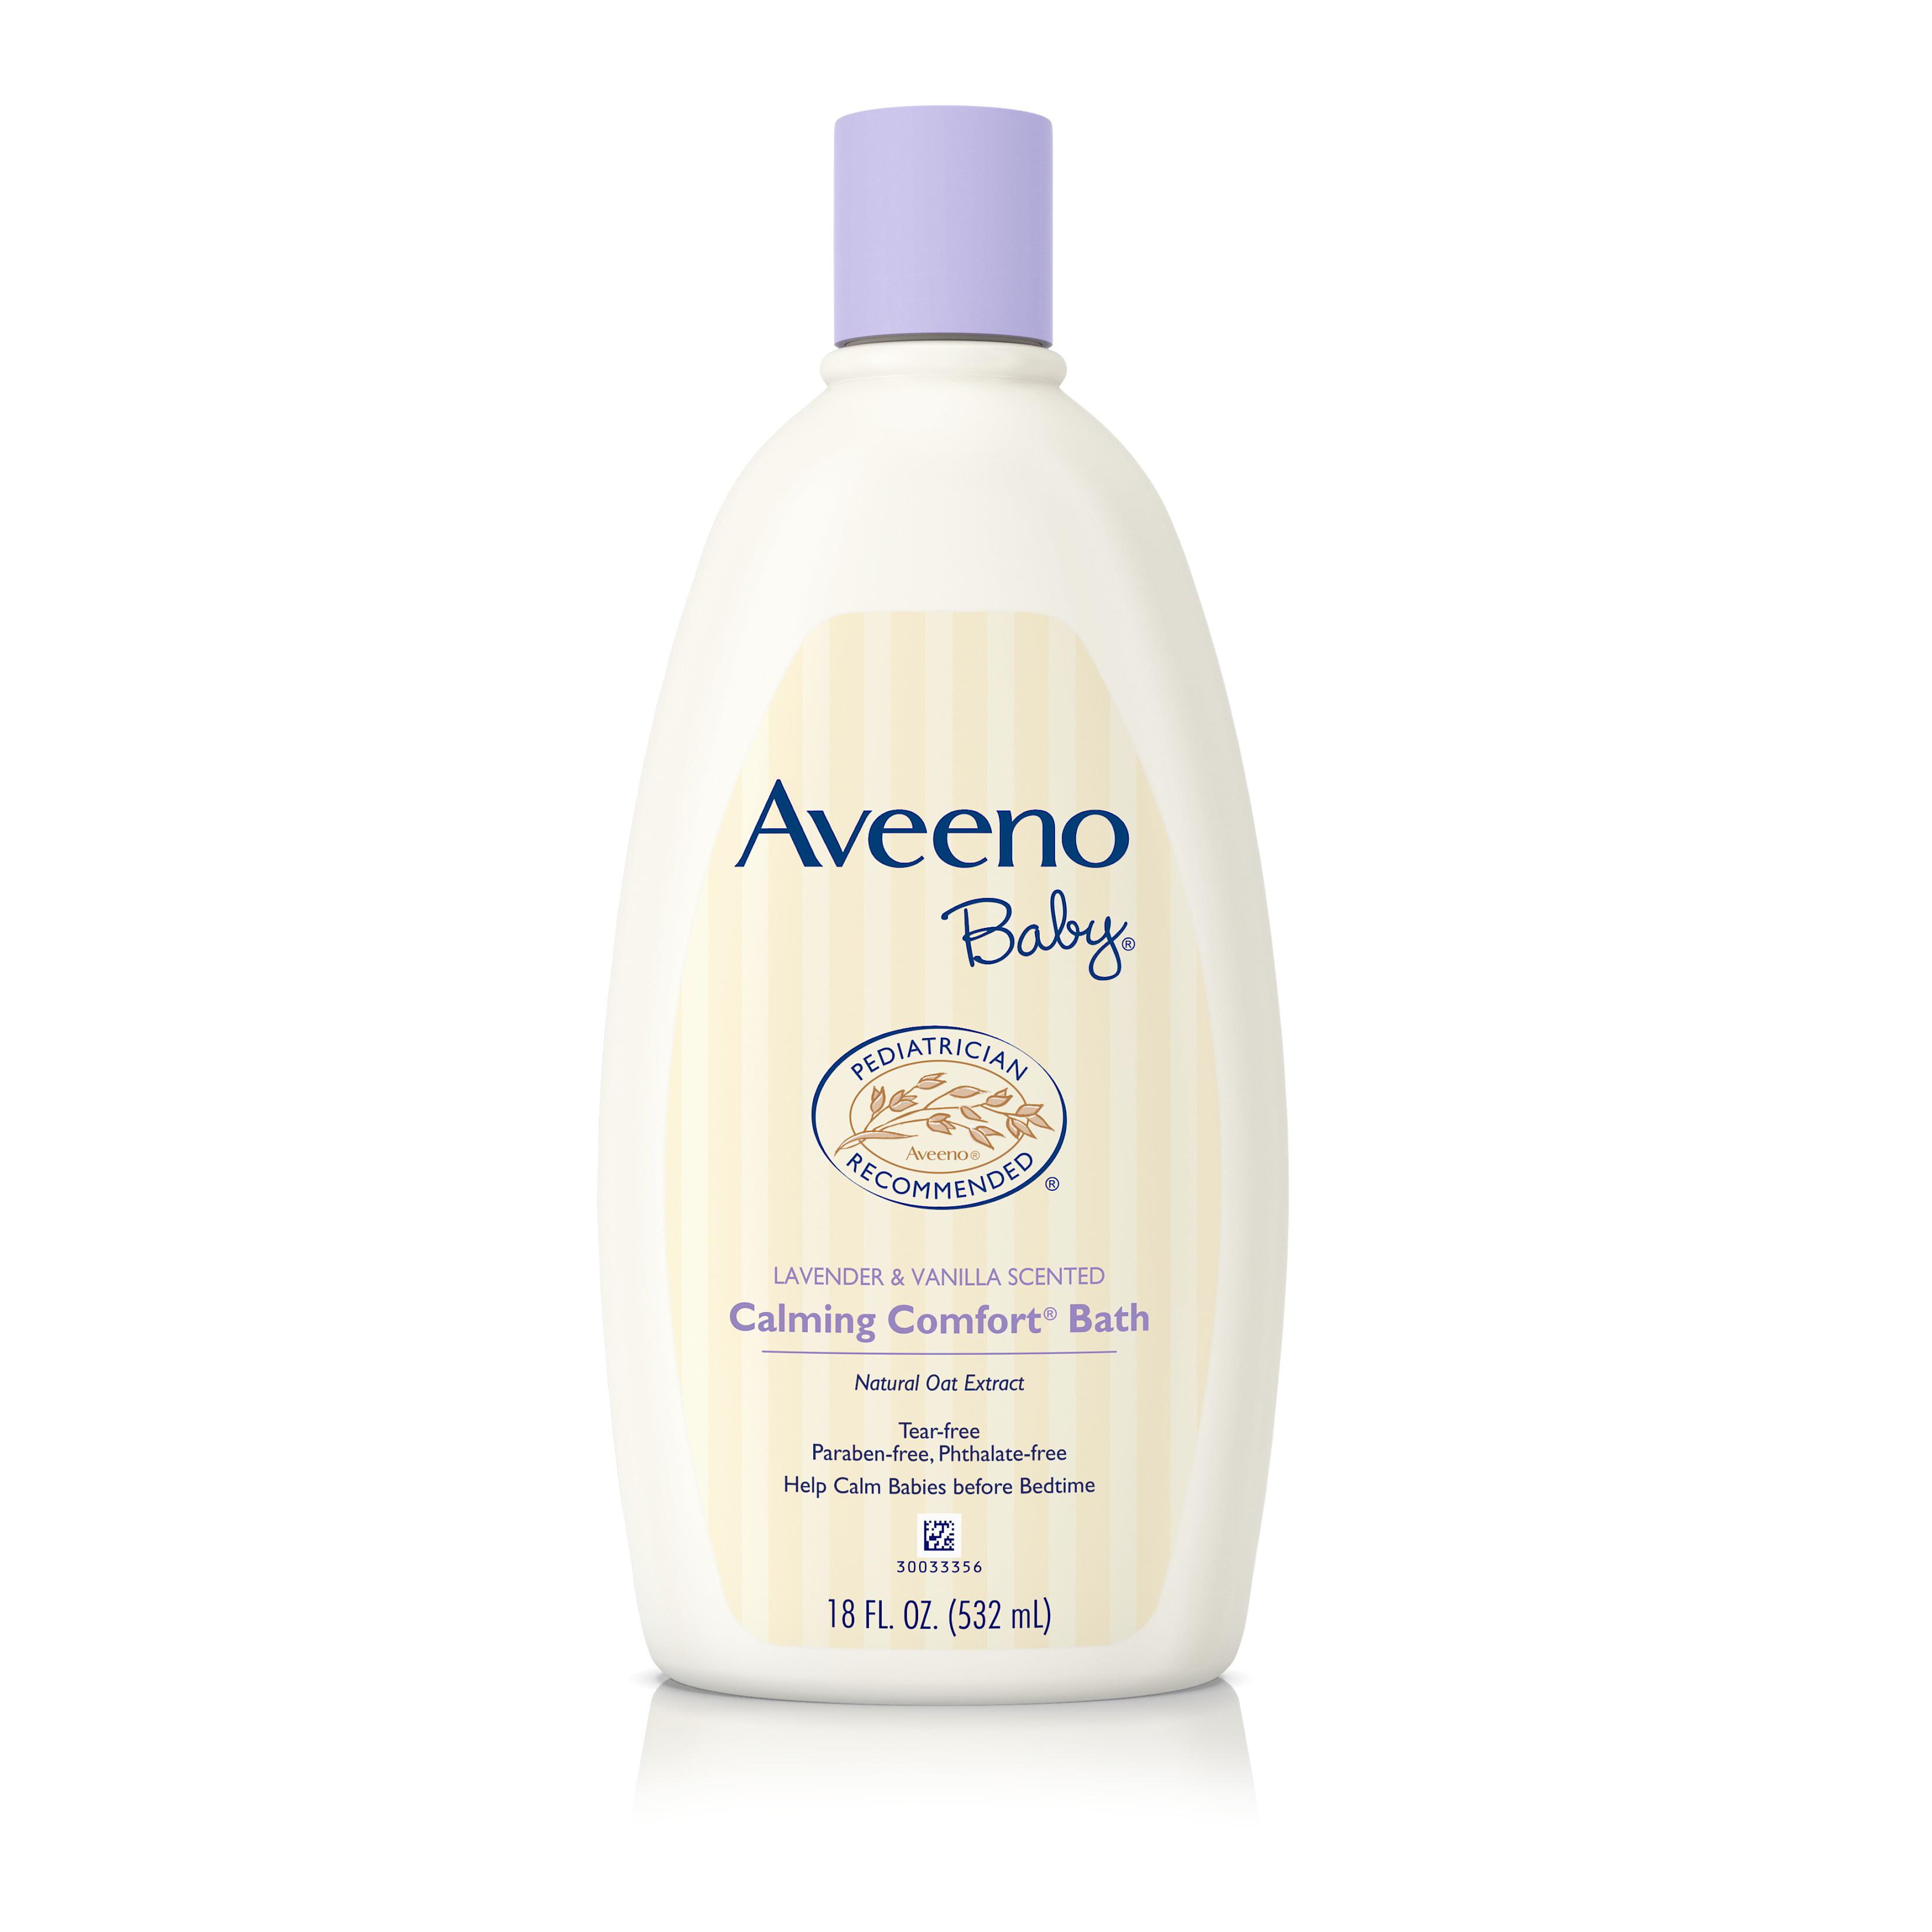 Aveeno Baby Calming Comfort Bath Wash, Tear Free, Lavender & Vanilla, 18 Fl. Oz. - Walmart.com